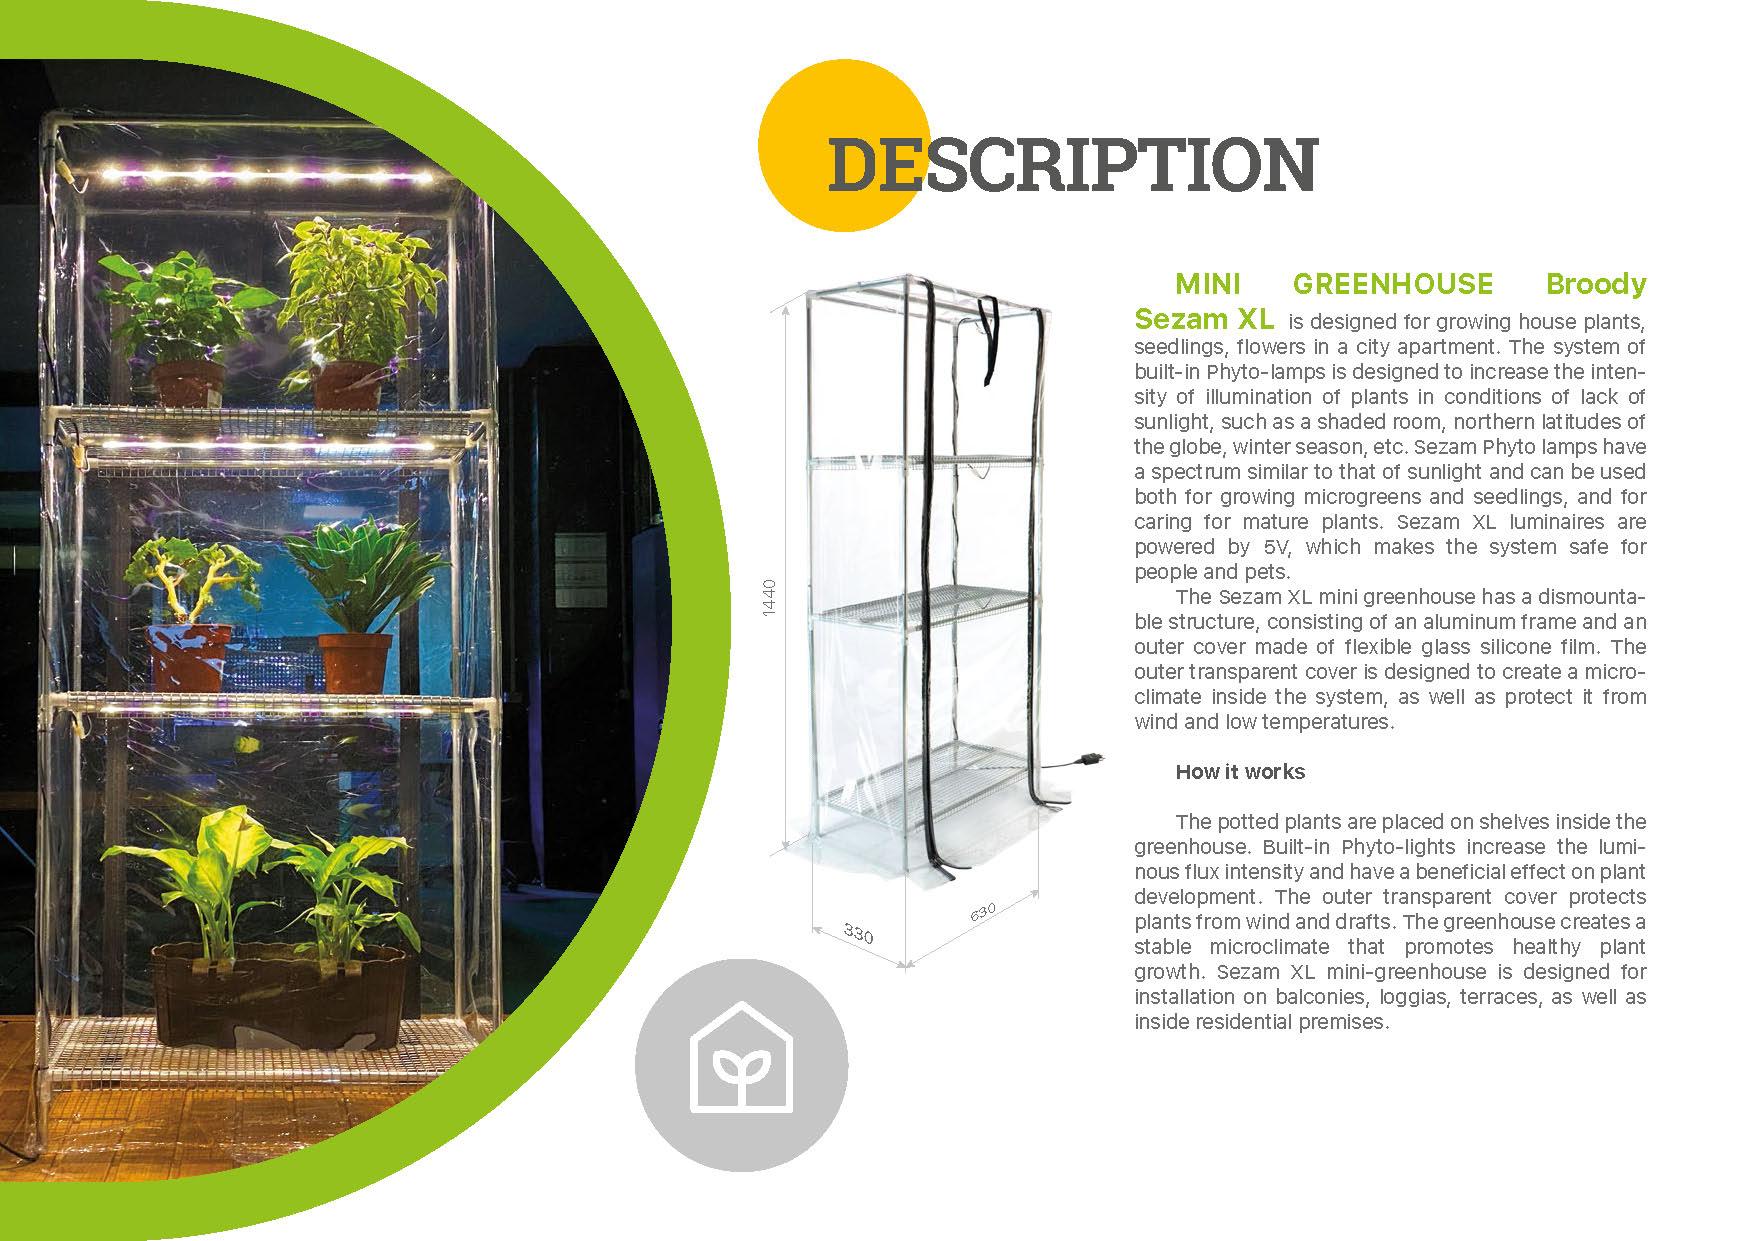 Sezam_XL_indoor_greenhouse_system_02